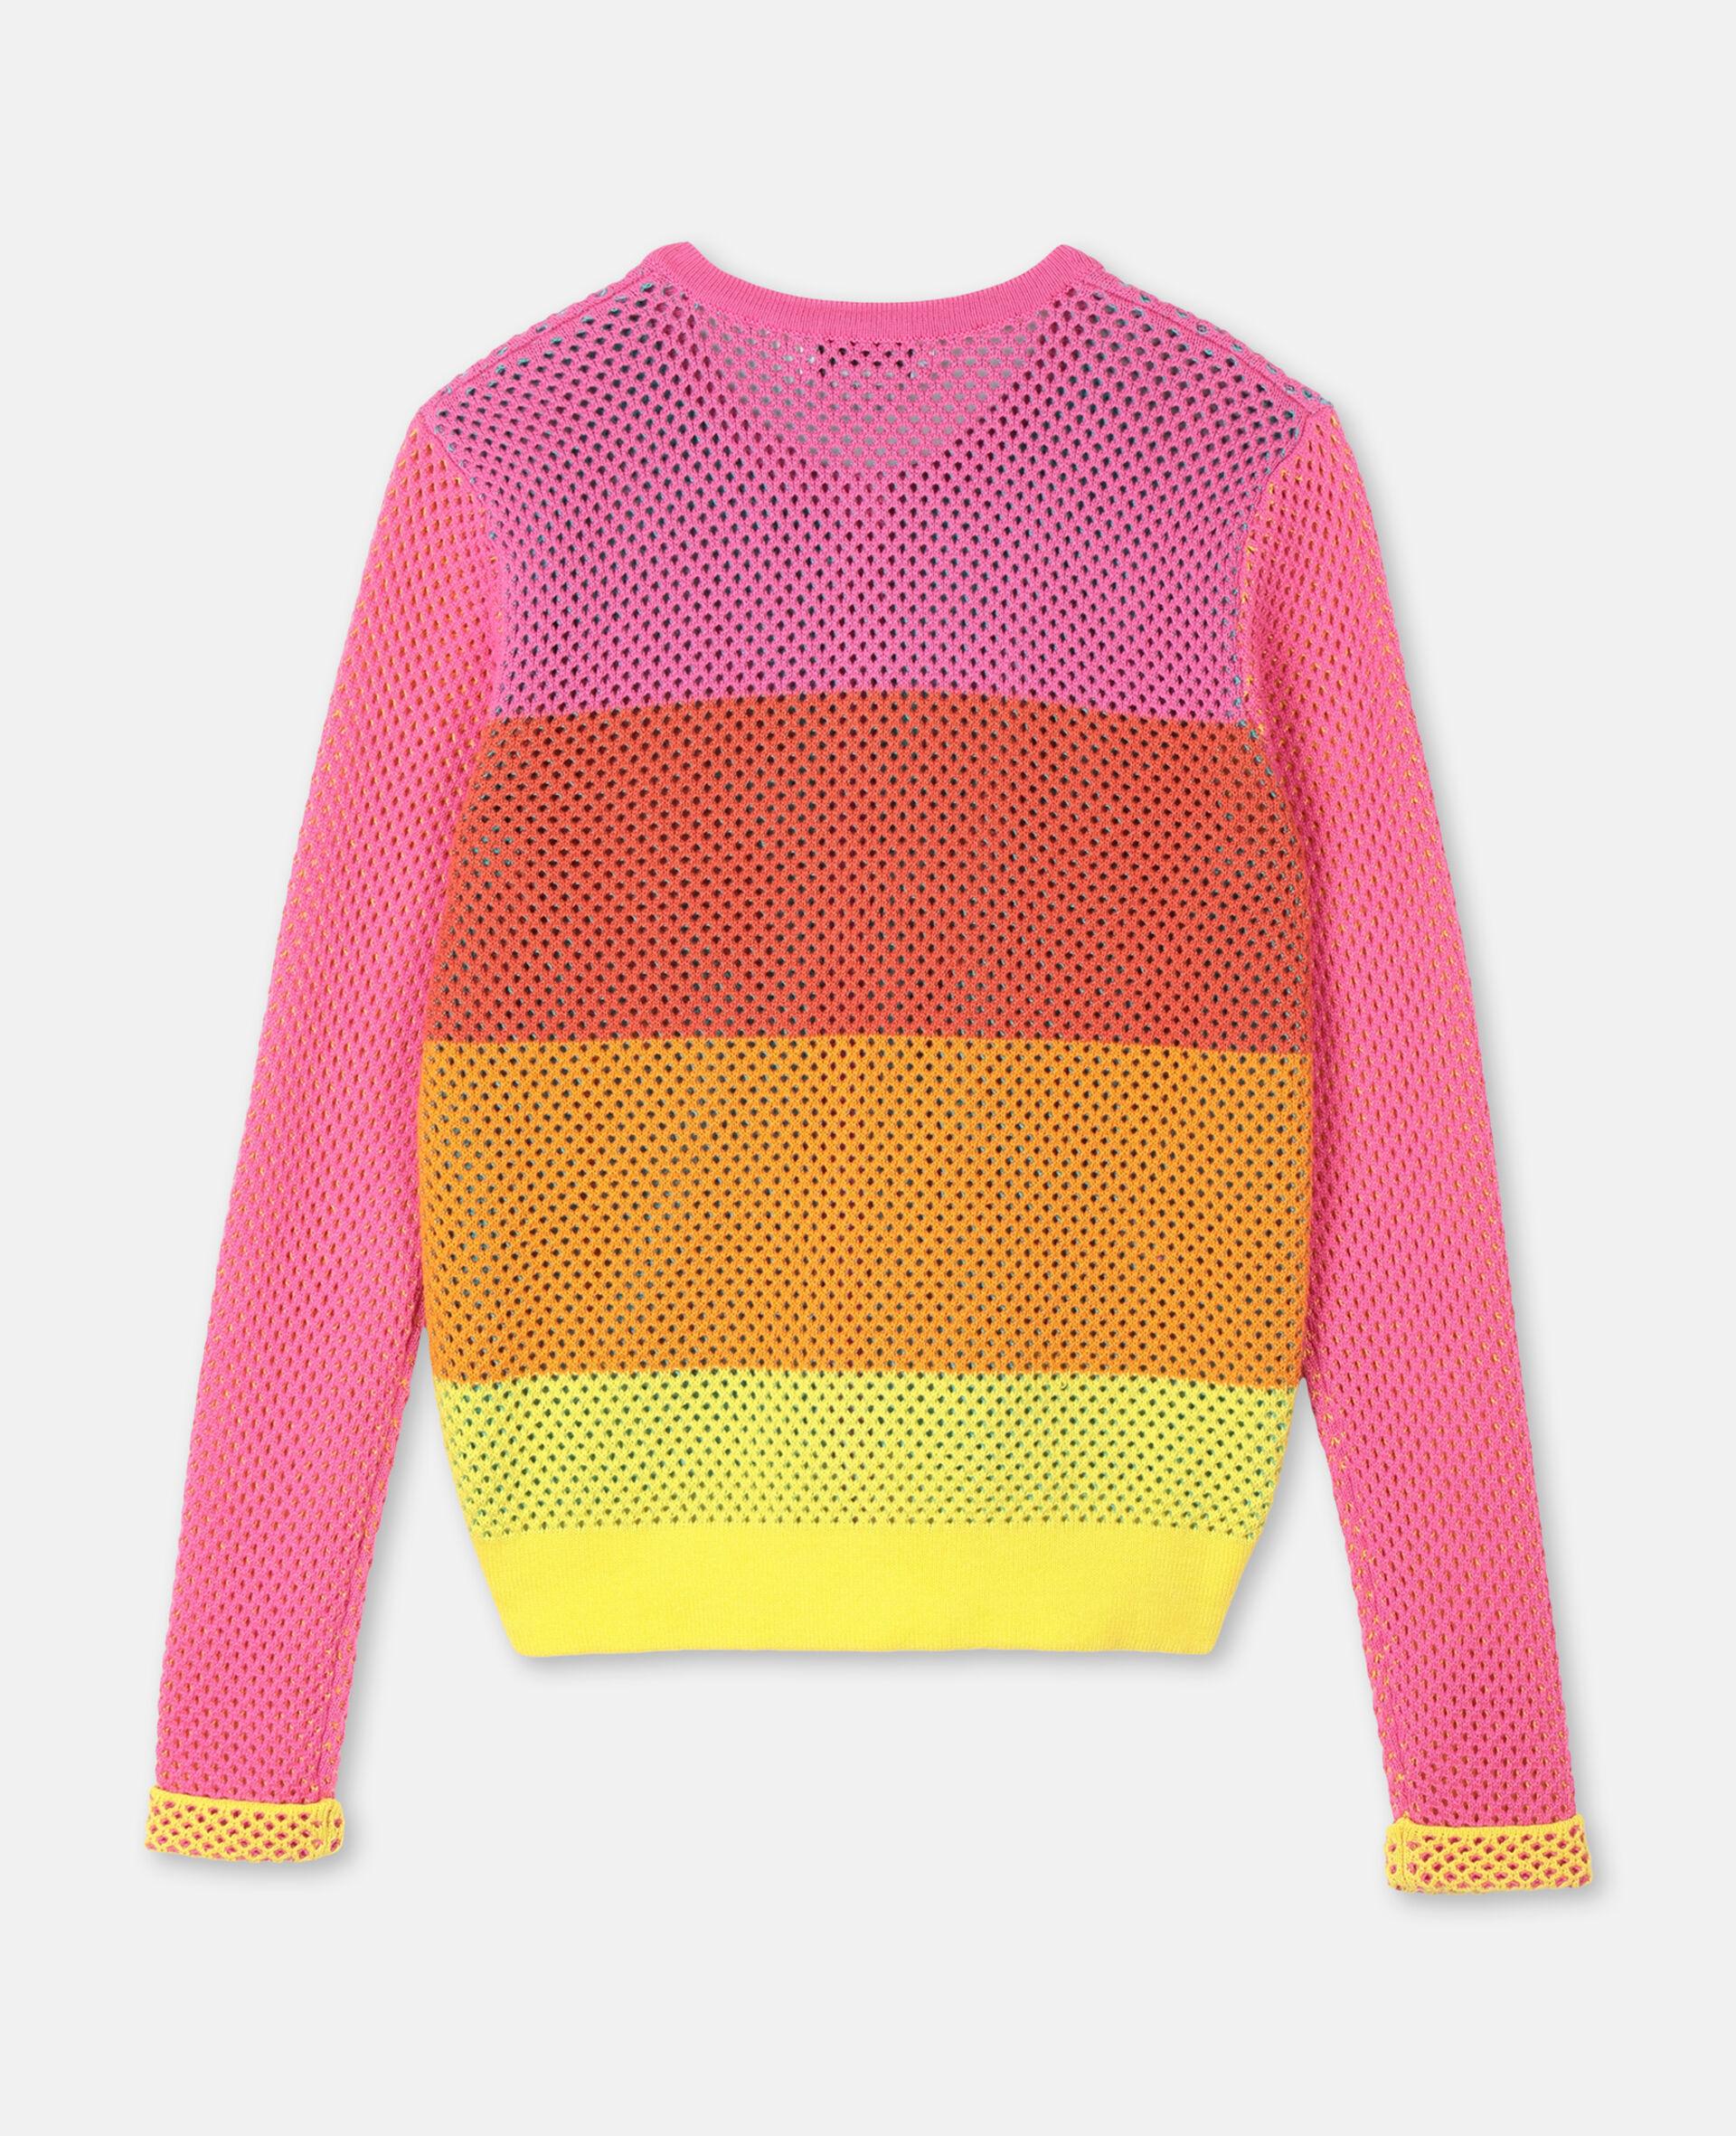 Intarsia Mesh Knit Cotton Cardigan-Multicoloured-large image number 3